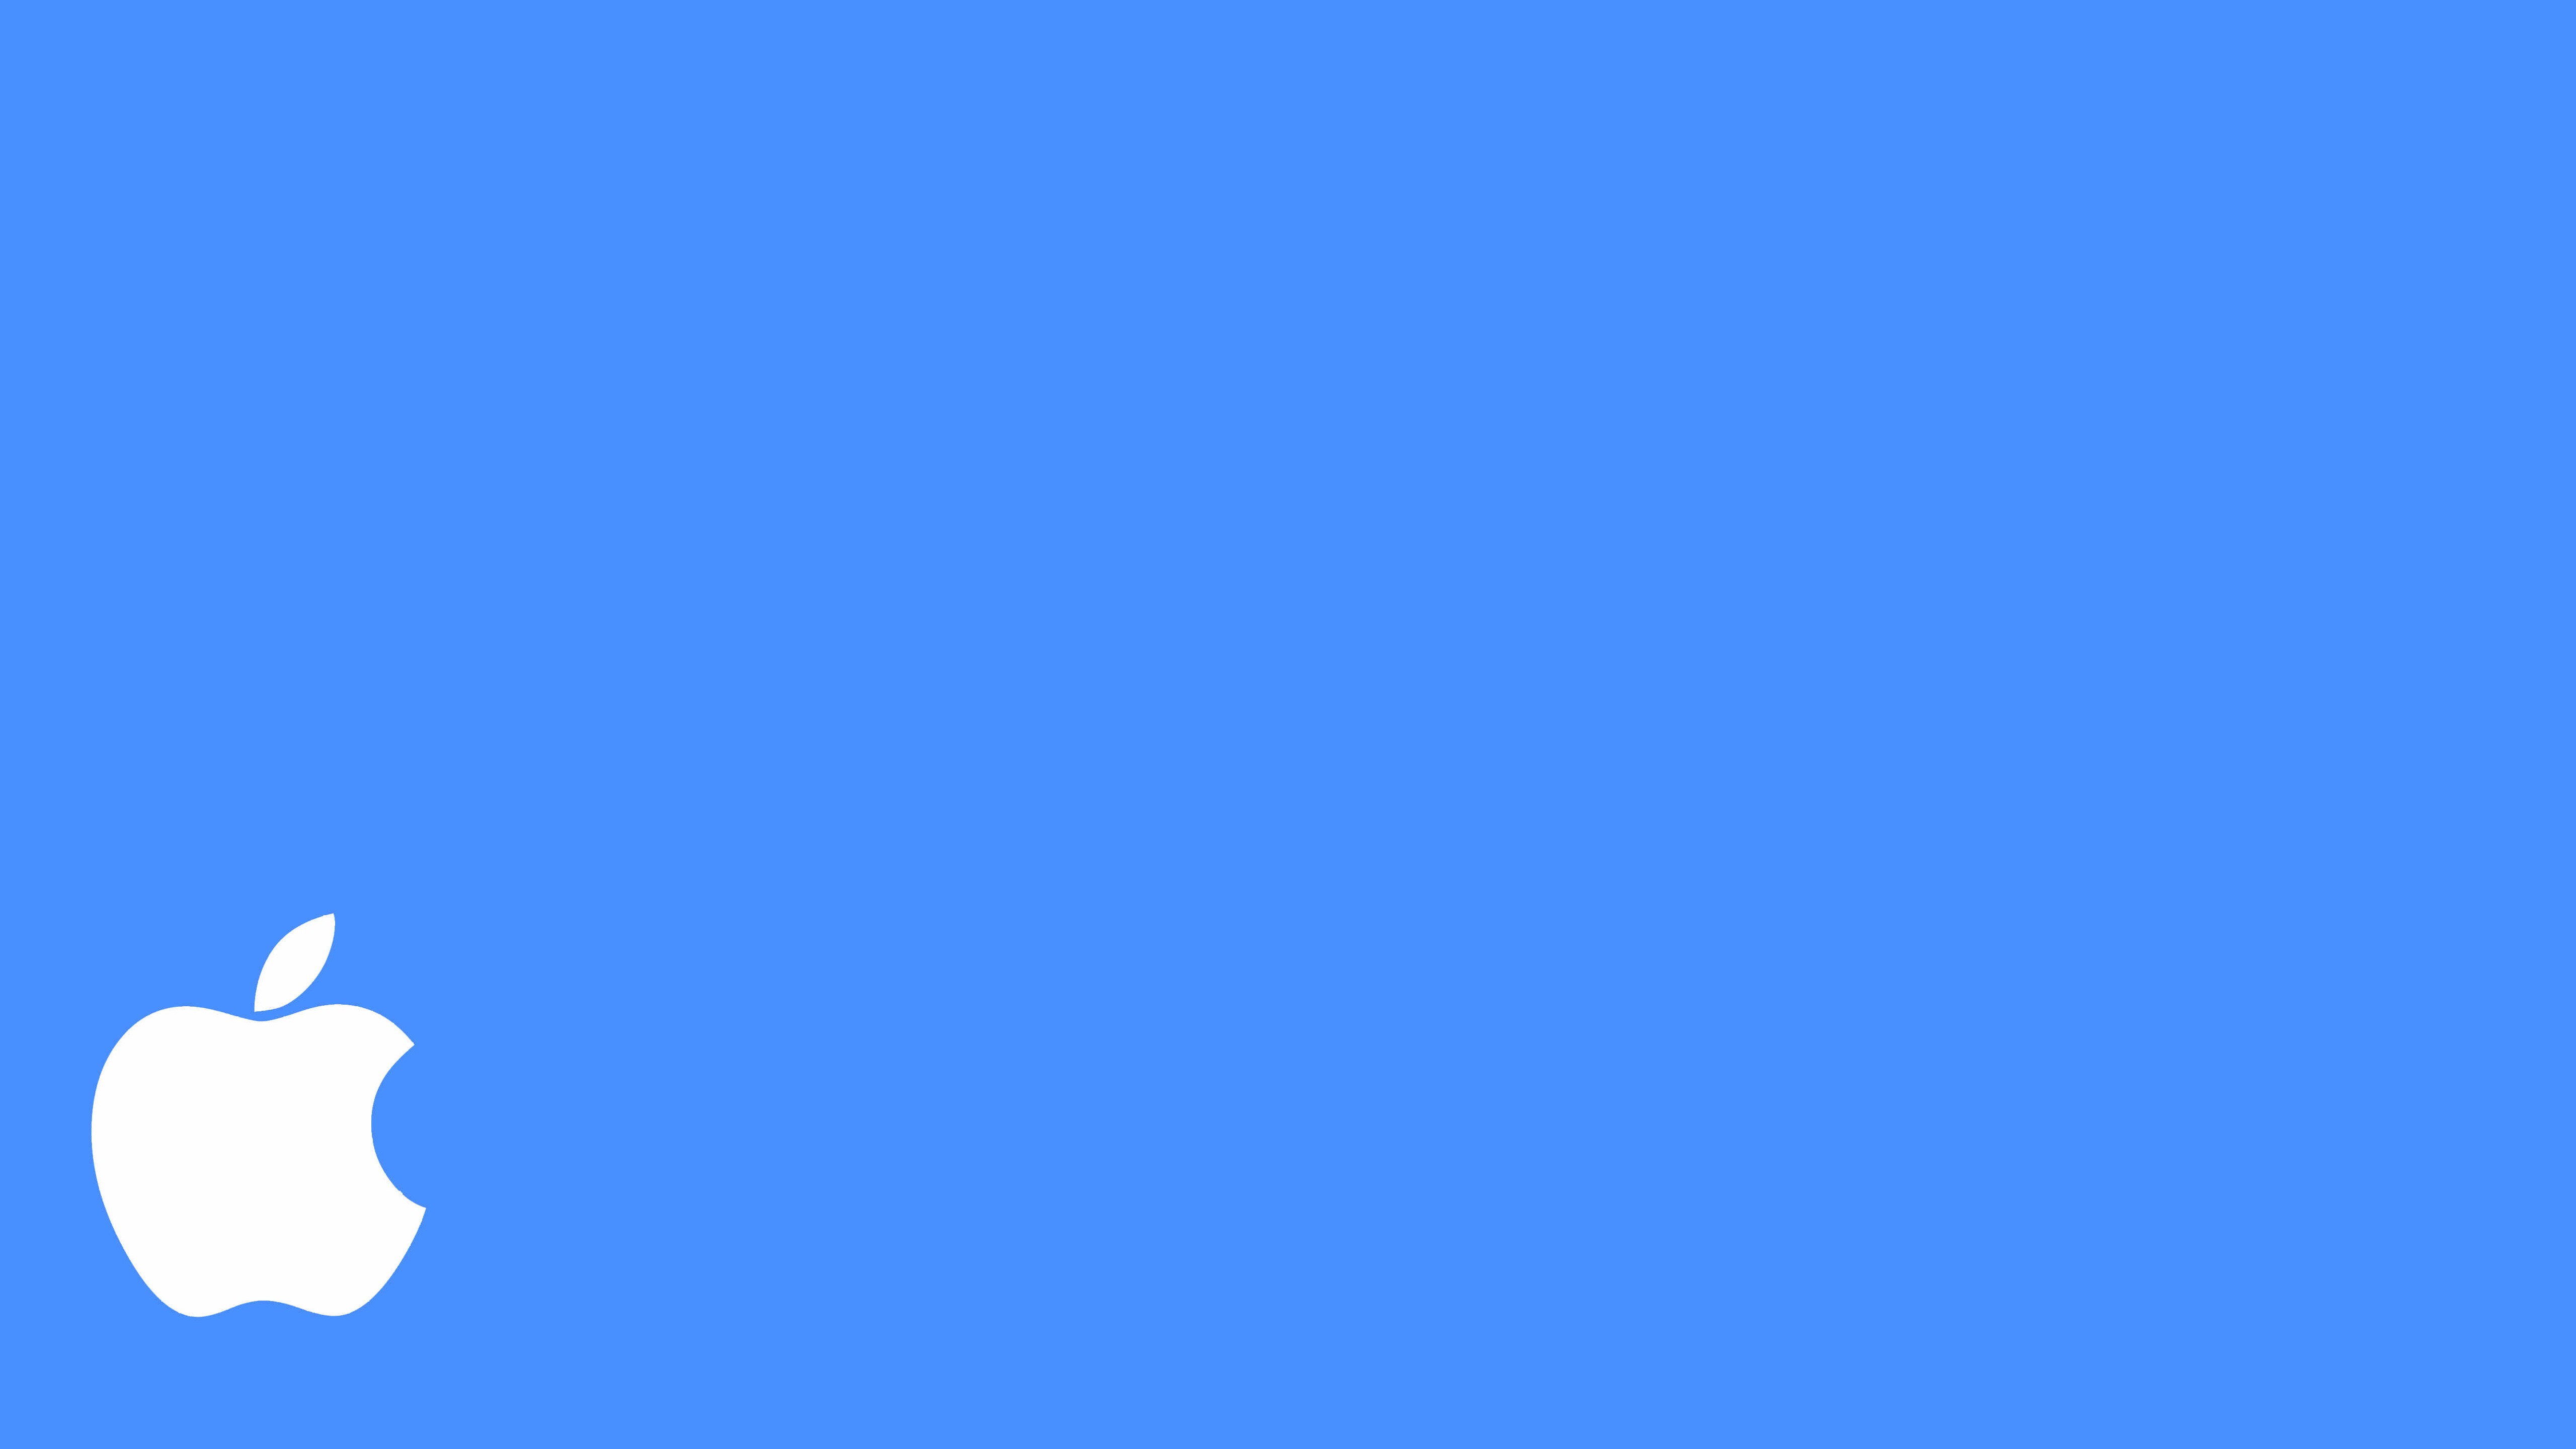 blue apple wallpaper ipad